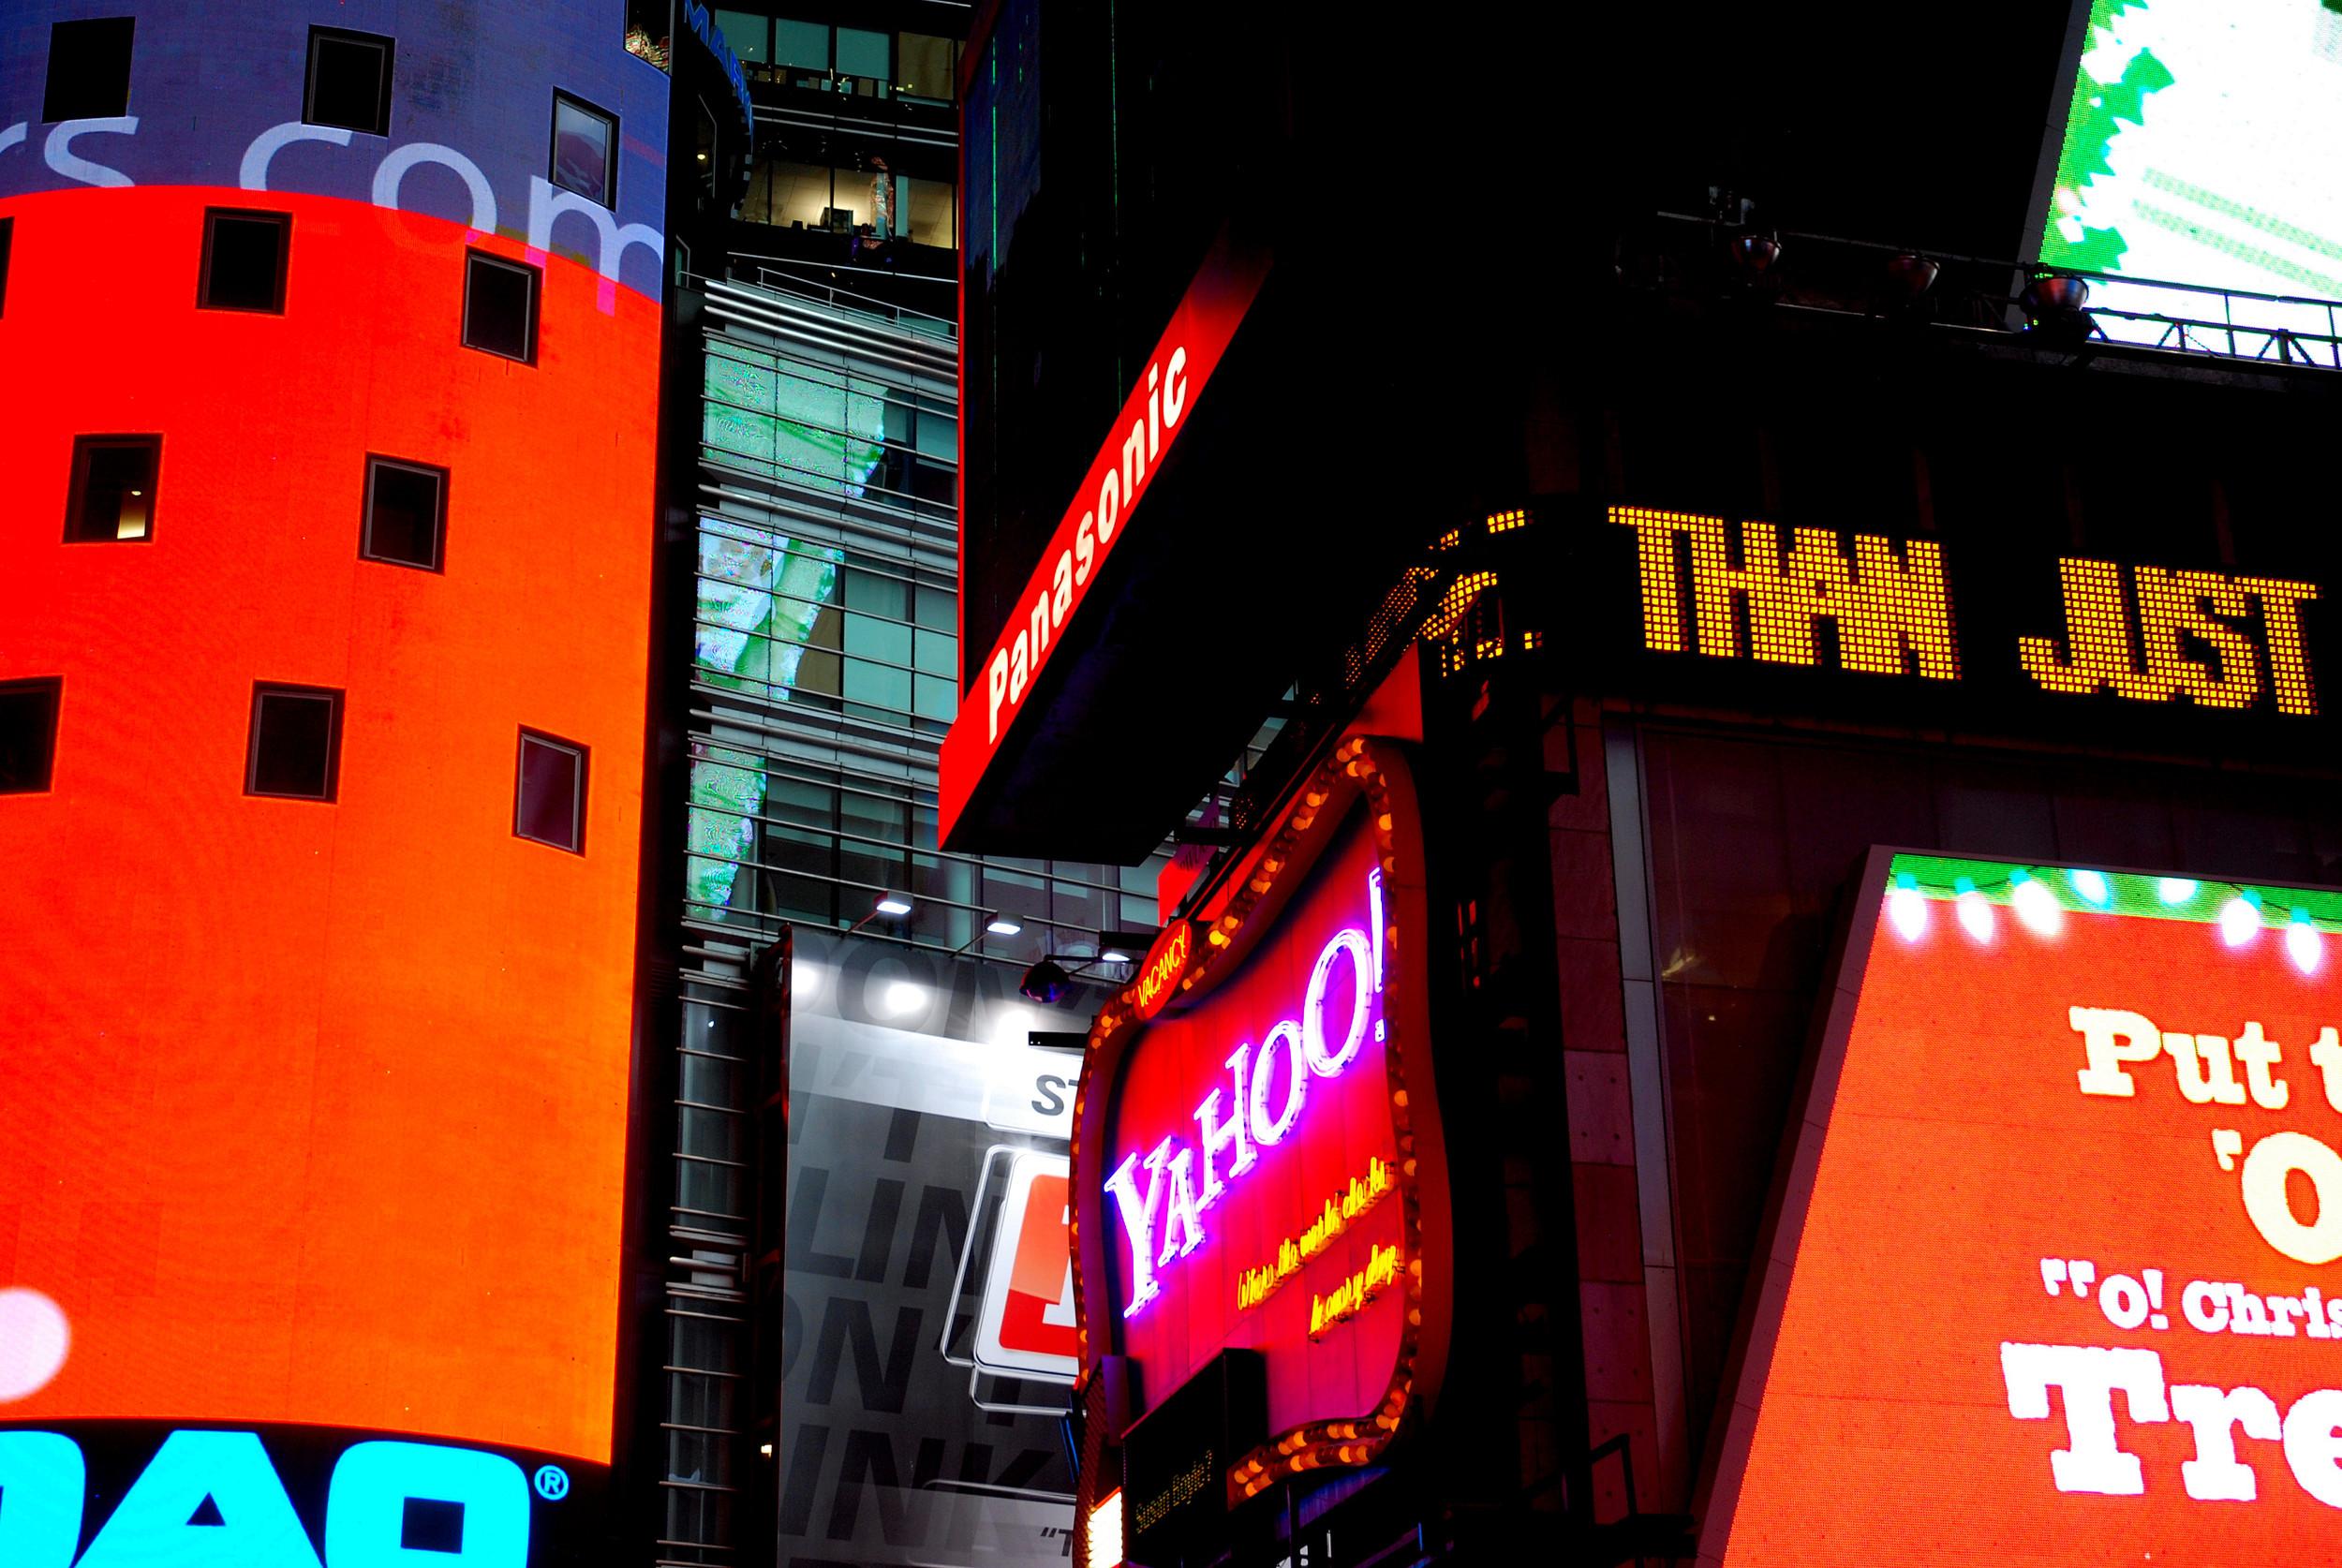 New_York_Dec_2009.jpg